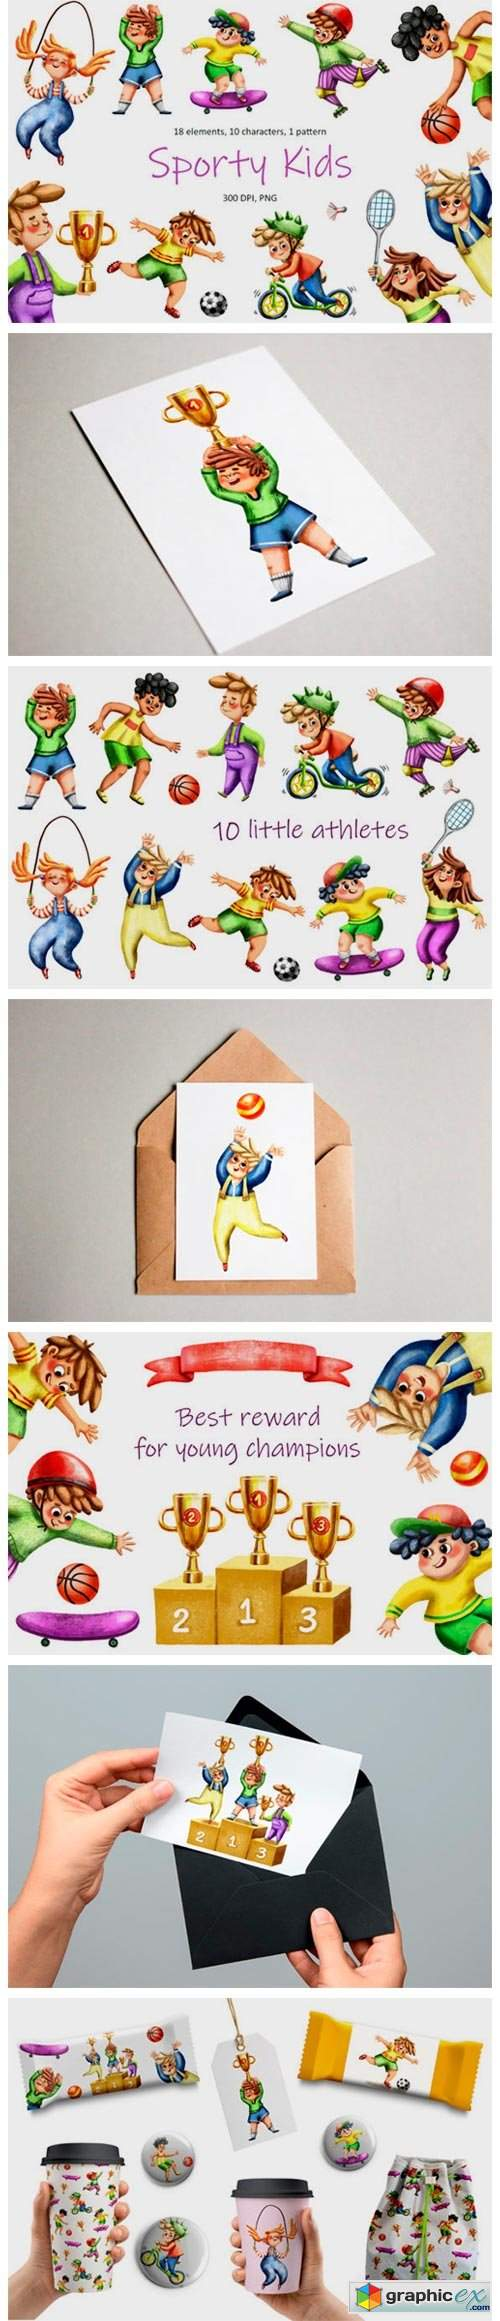 Sporty Kids - Clip Art Set